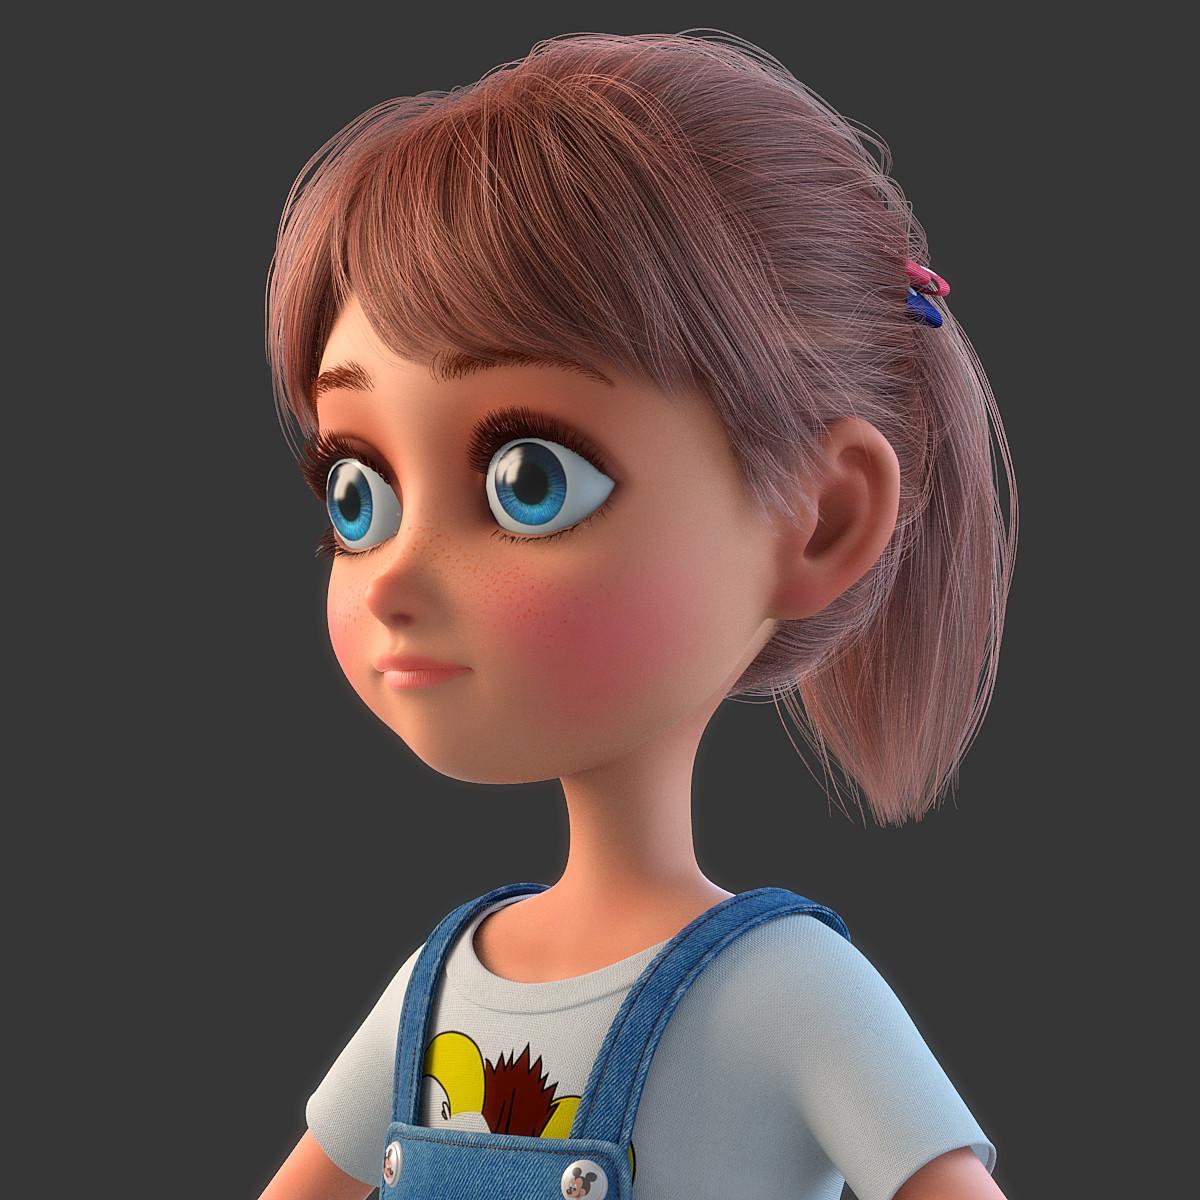 3d model of cartoon girl rigged